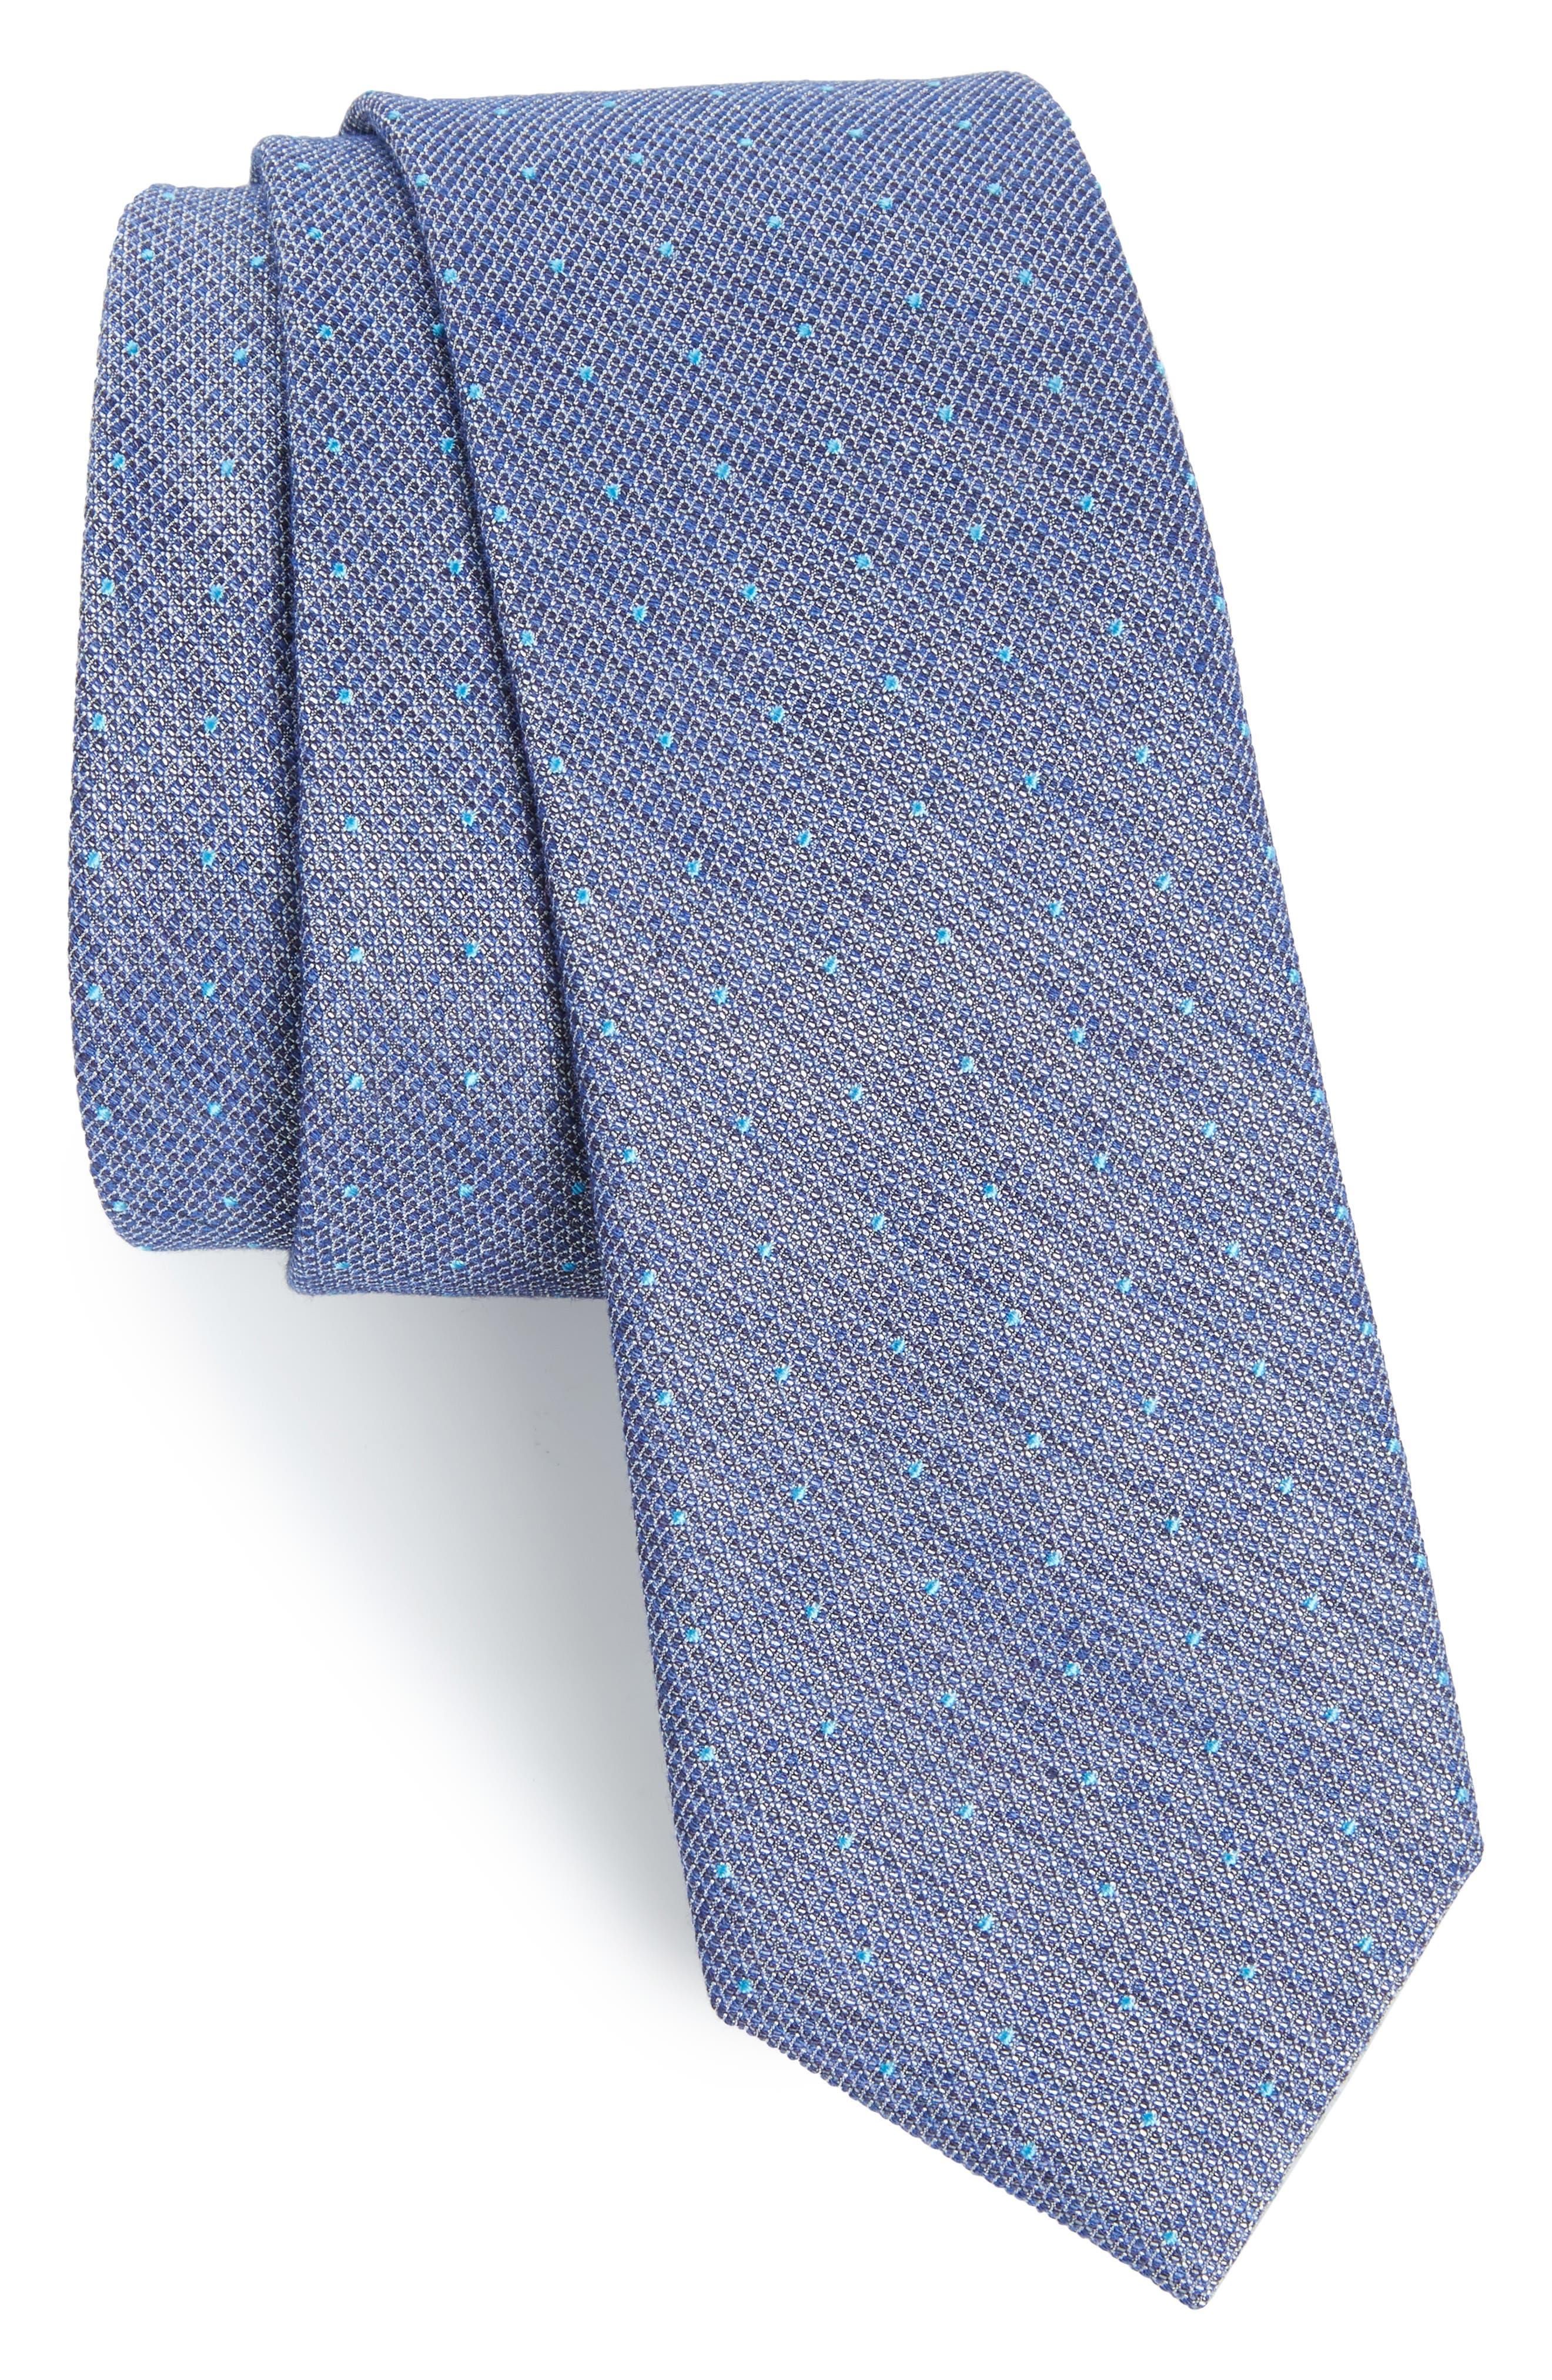 Dot Silk Blend Skinny Tie,                         Main,                         color, Aqua/ Teal